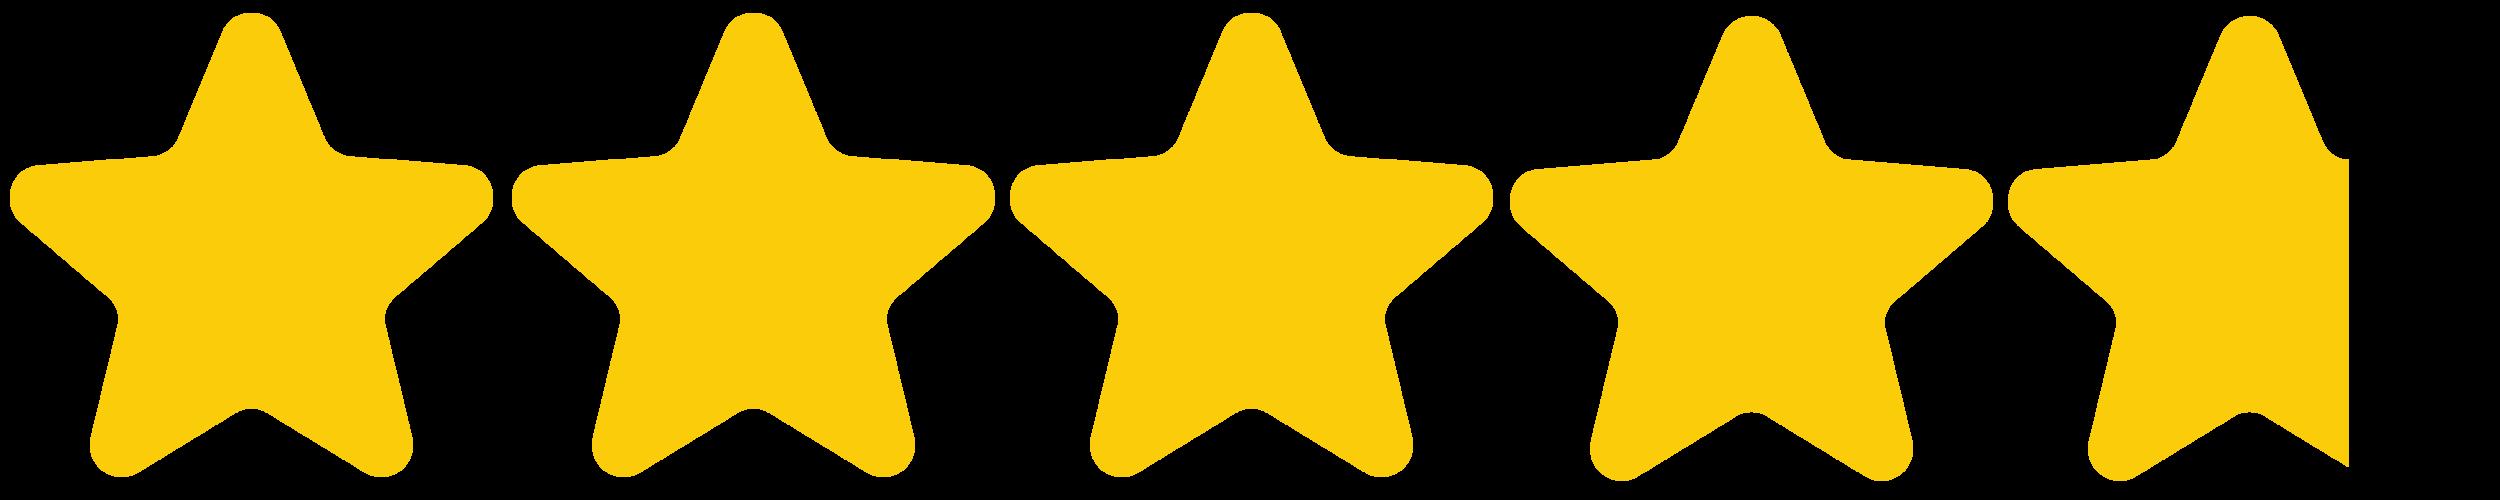 - (4.75 stars)